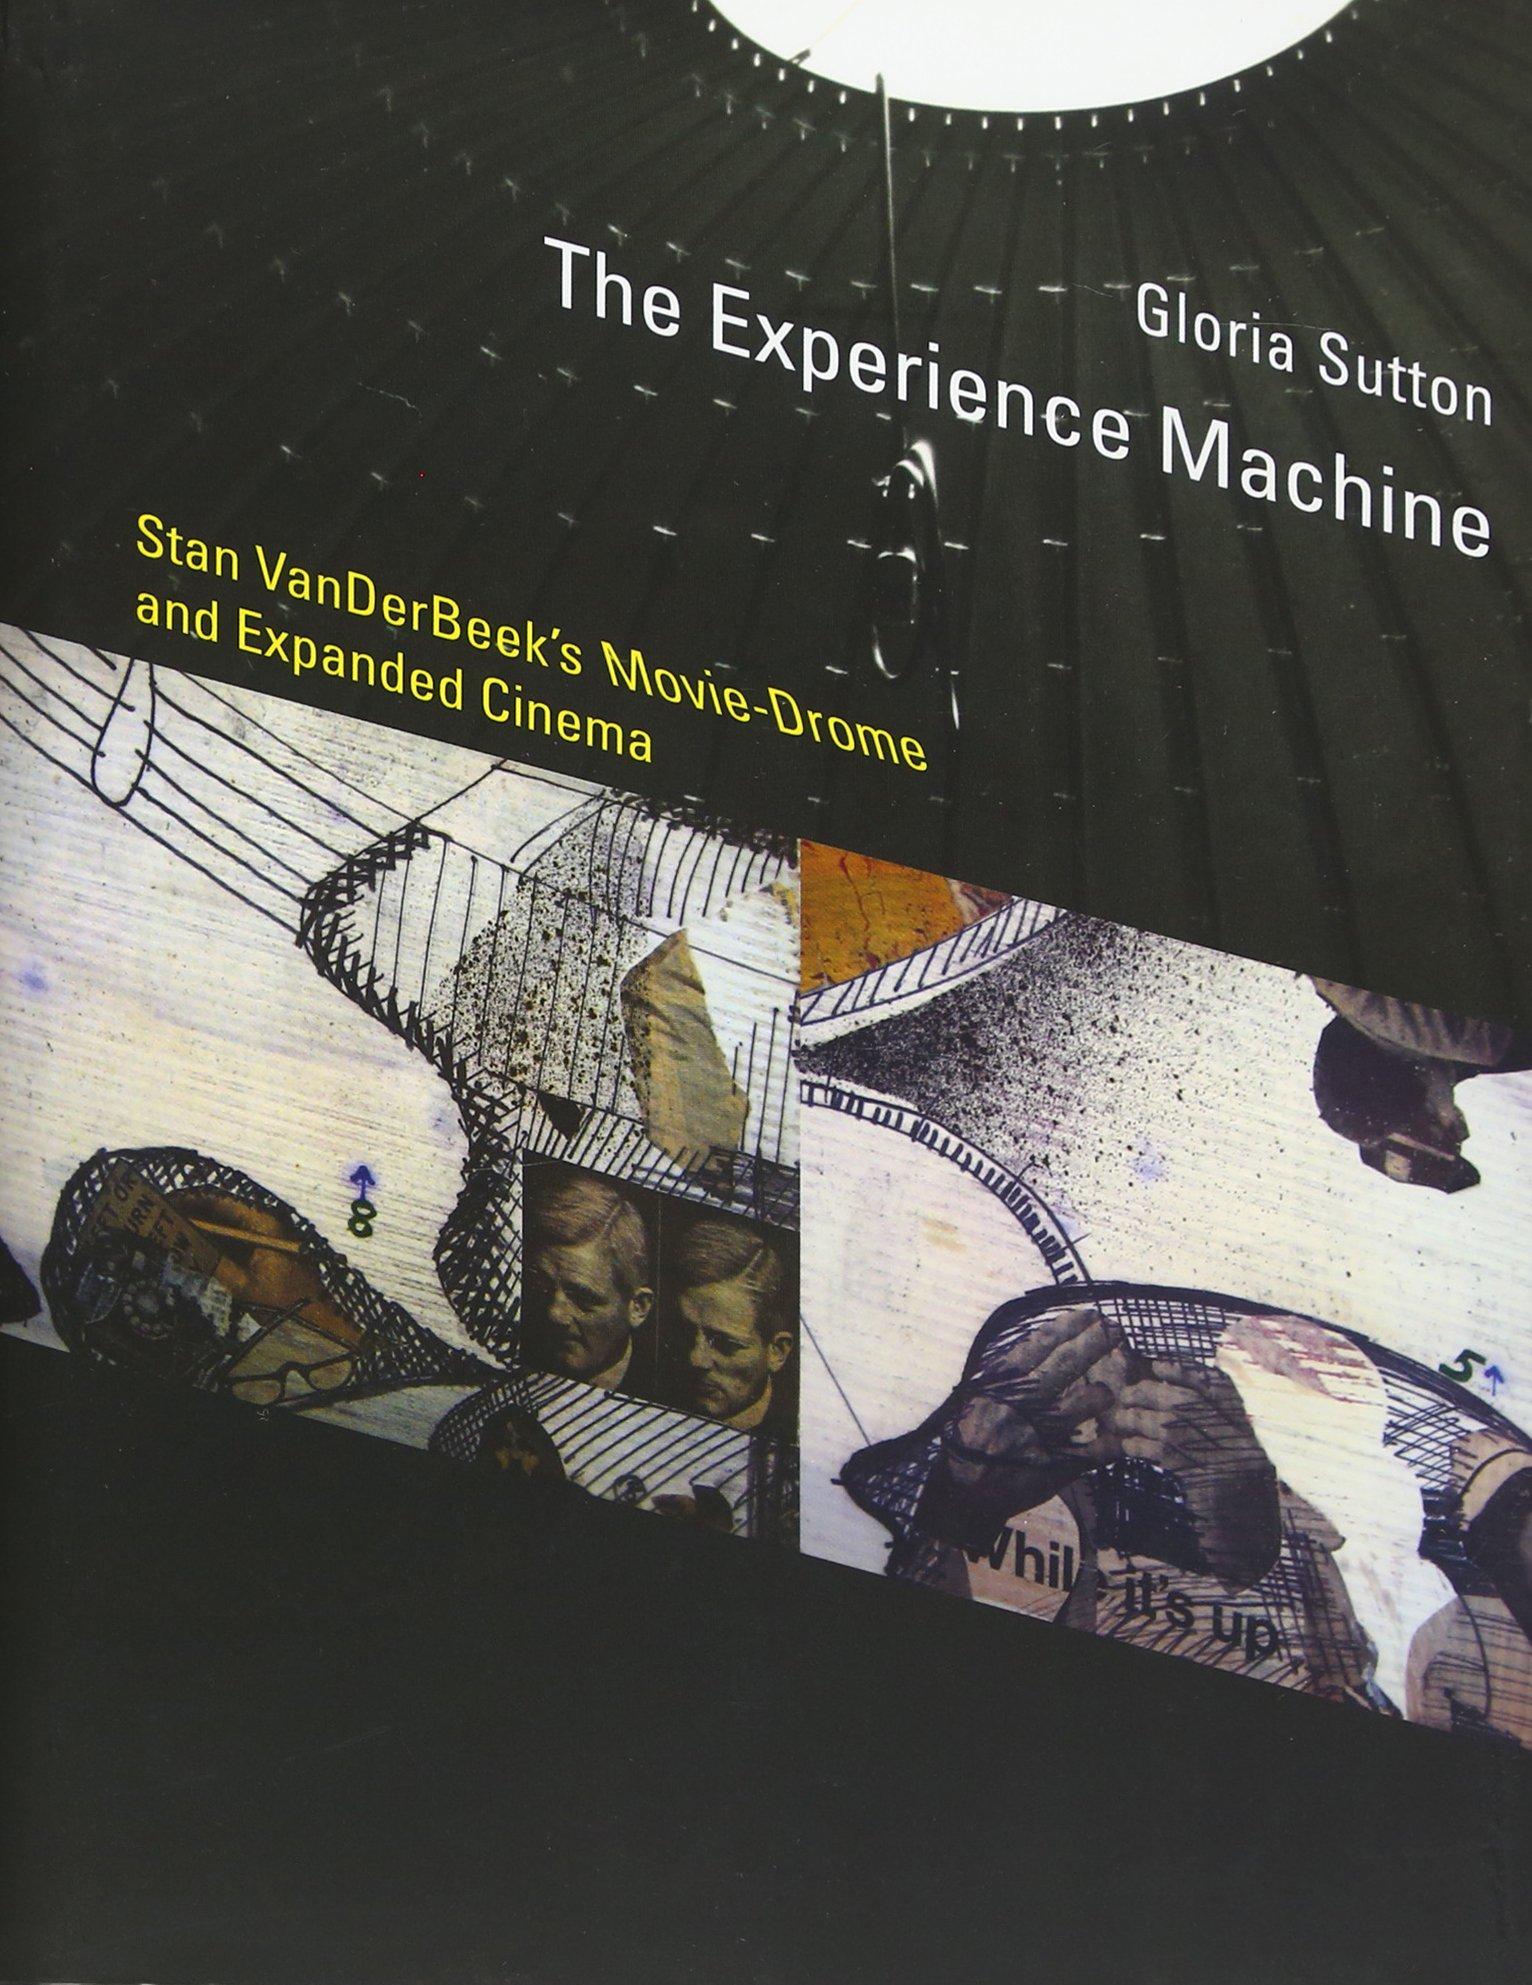 Download The Experience Machine: Stan VanDerBeek's Movie-Drome and Expanded Cinema (Leonardo) ebook